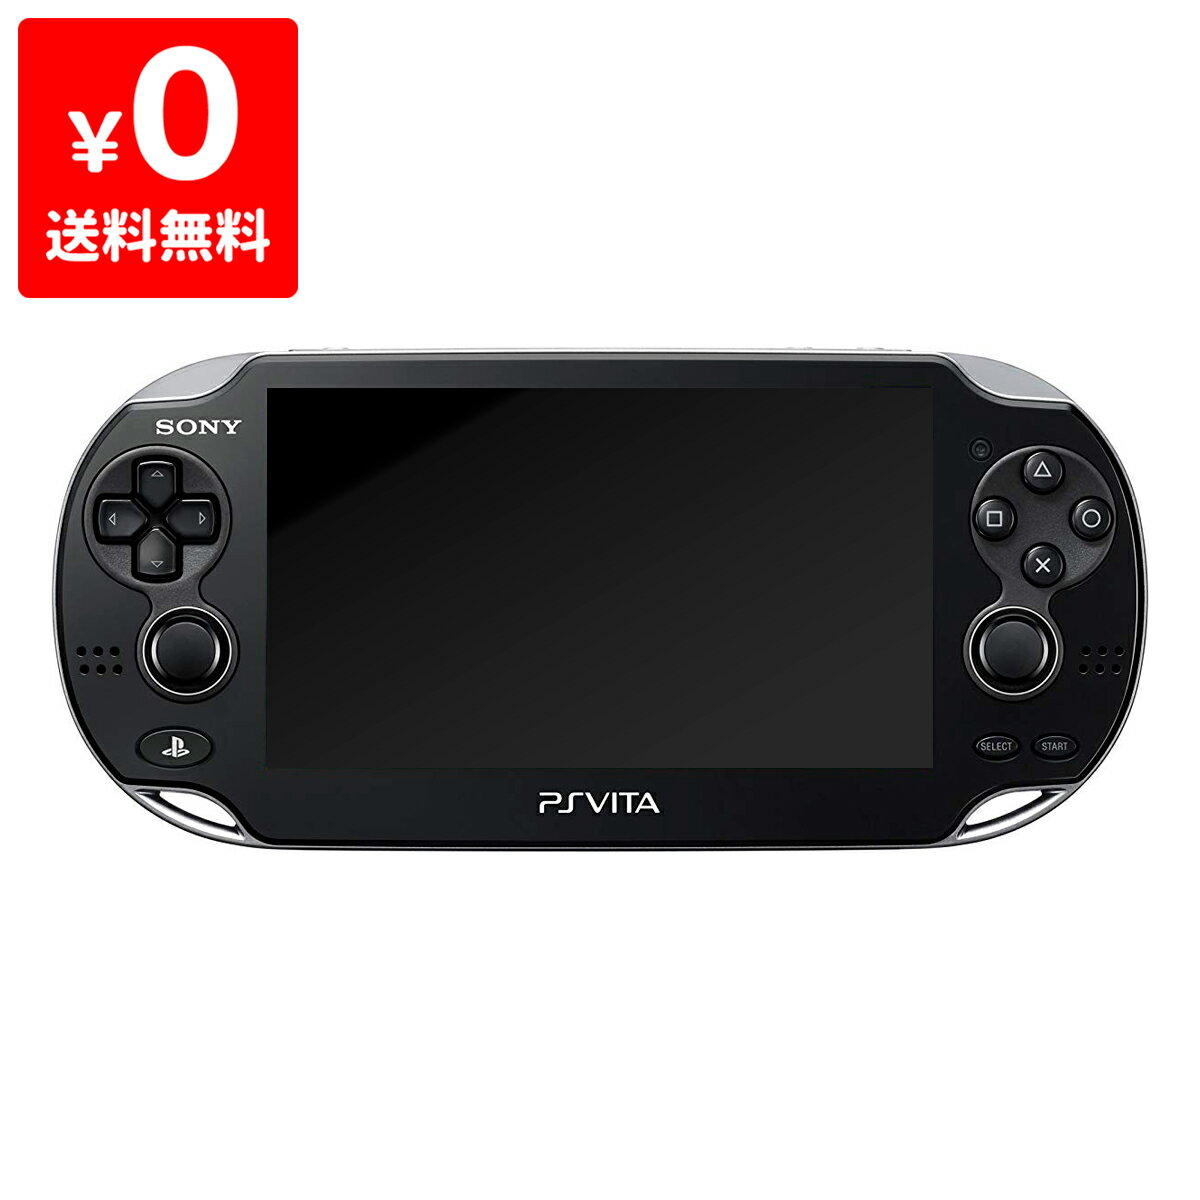 PSVita PlayStation Vita 3G/Wi‐Fiモデル クリスタル・ブラック (PCH-1100 AA01) 本体のみ PlayStationVita SONY ソニー 中古 4948872412858 送料無料 【中古】